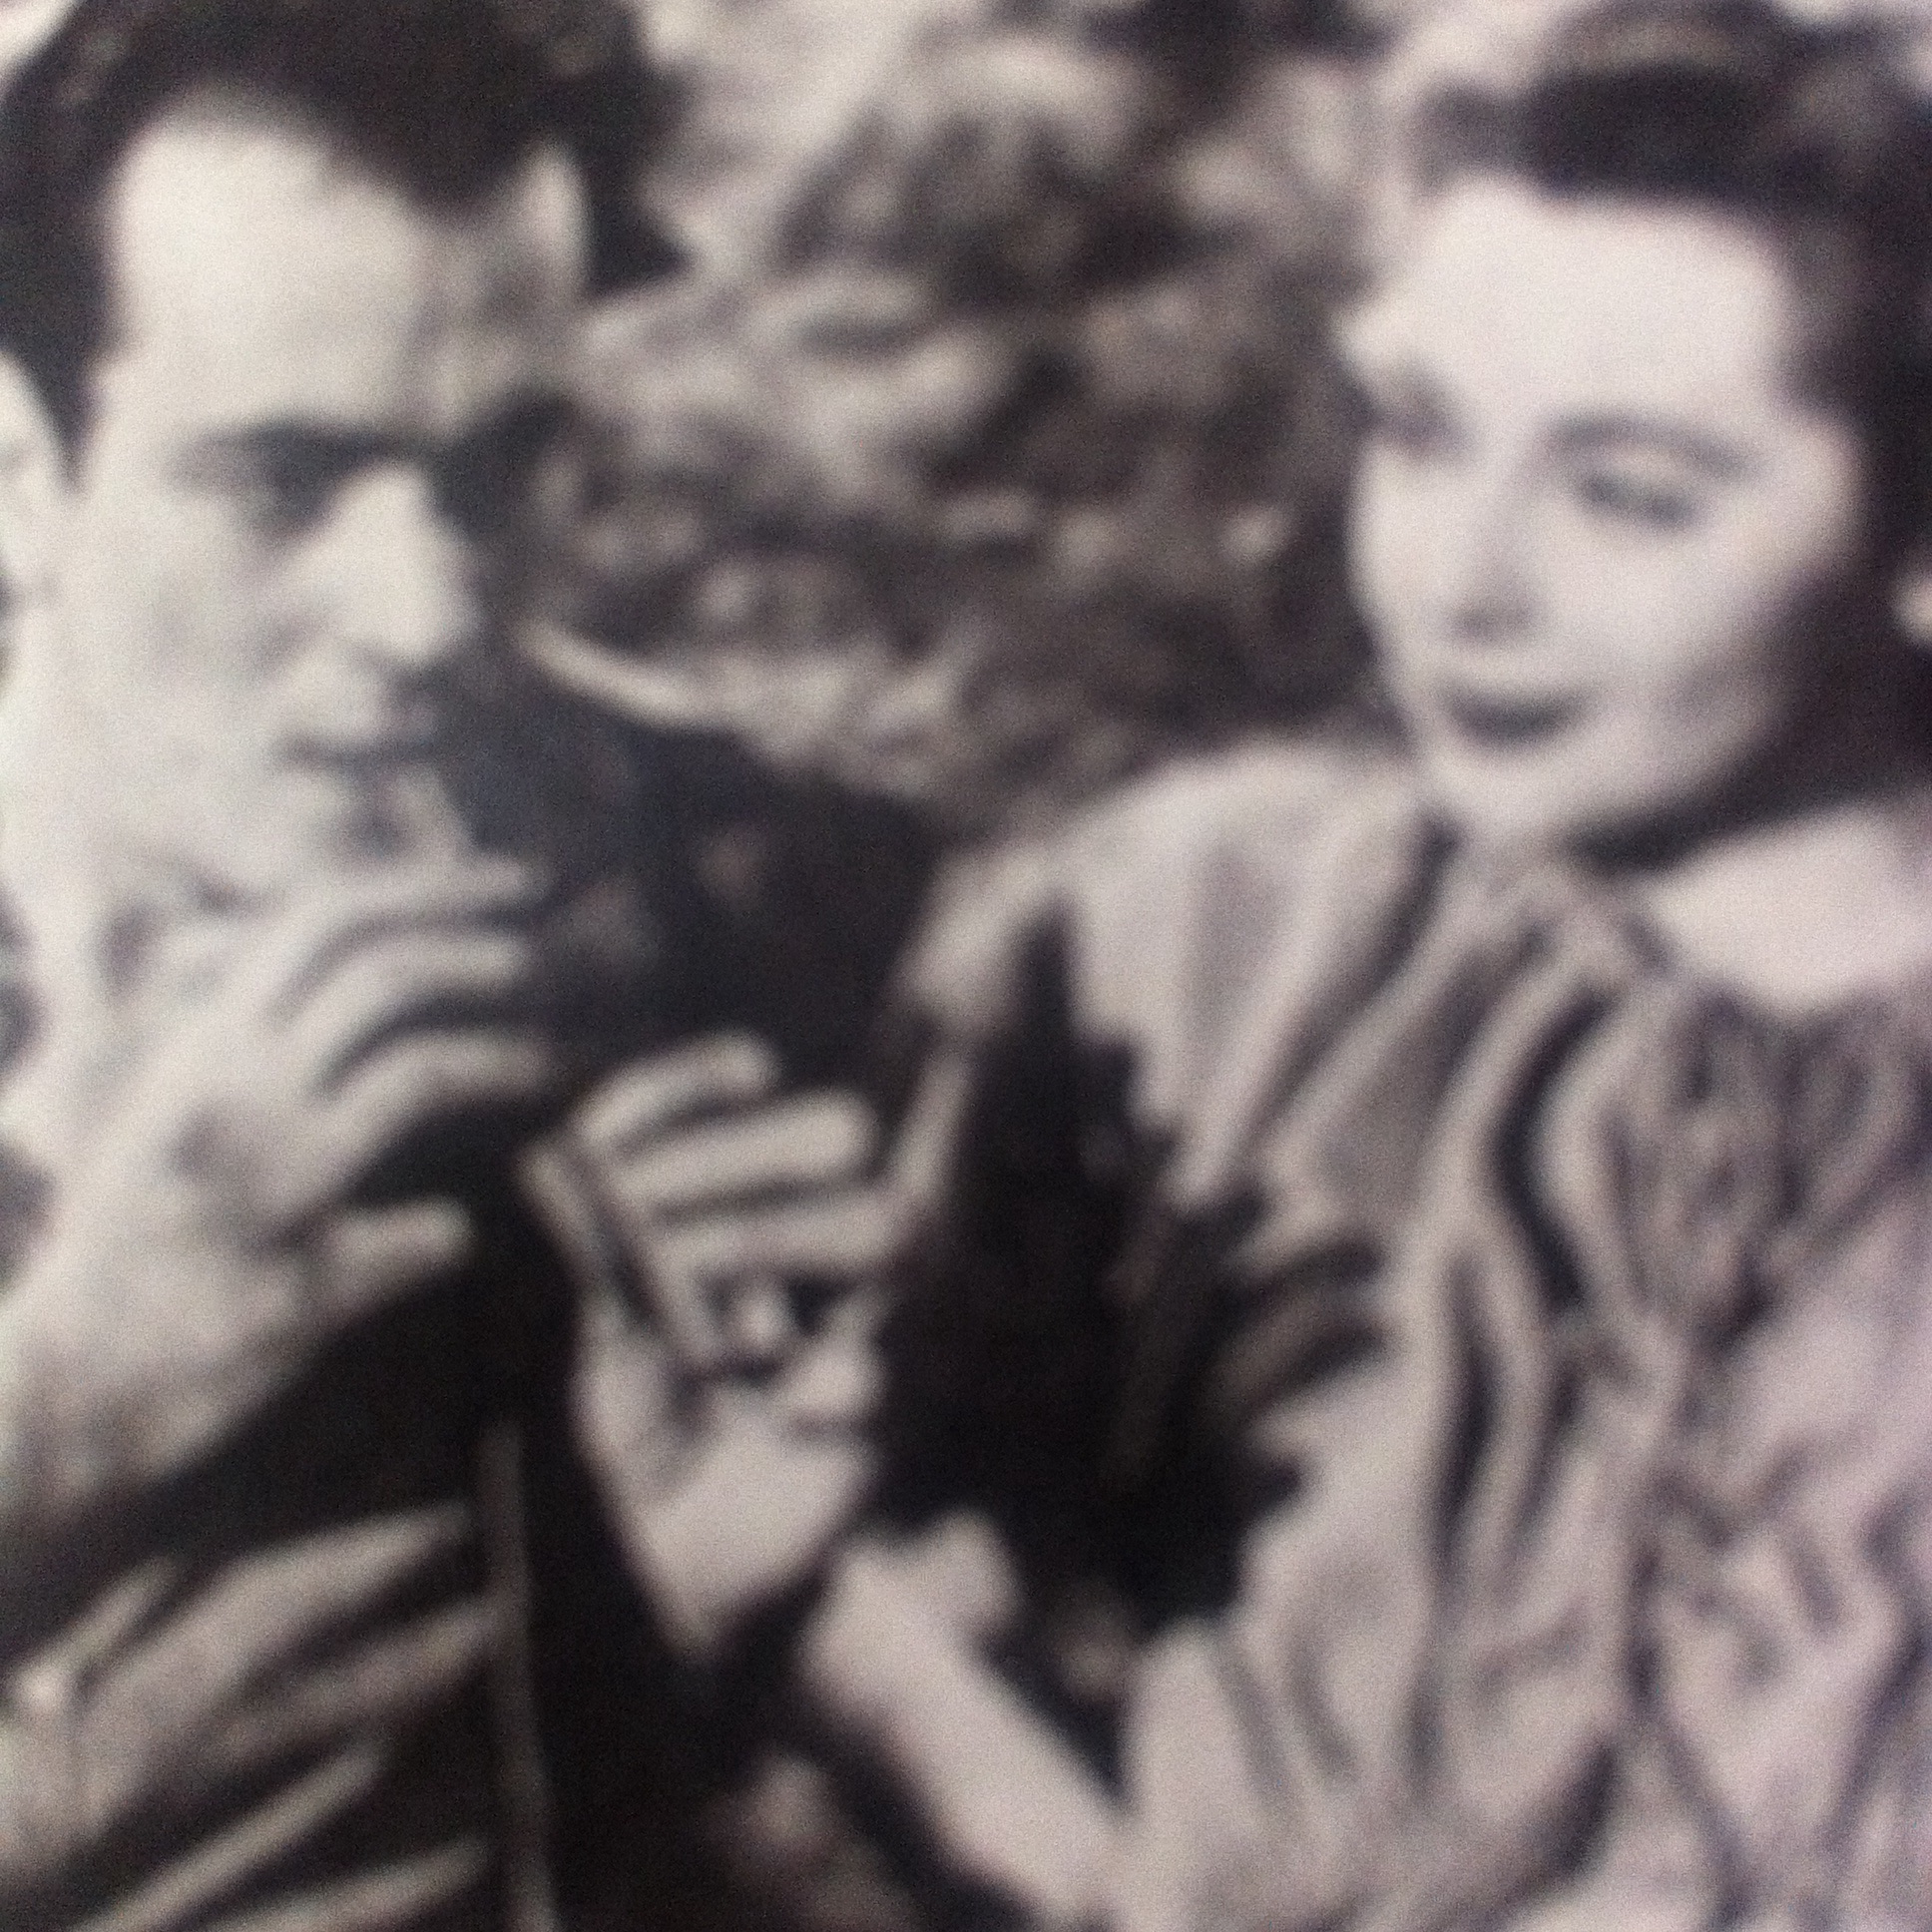 Mona Lisa (b. 1922),Steffani Brass Erotic pictures Mandy Ingber,Wendi McLendon-Covey